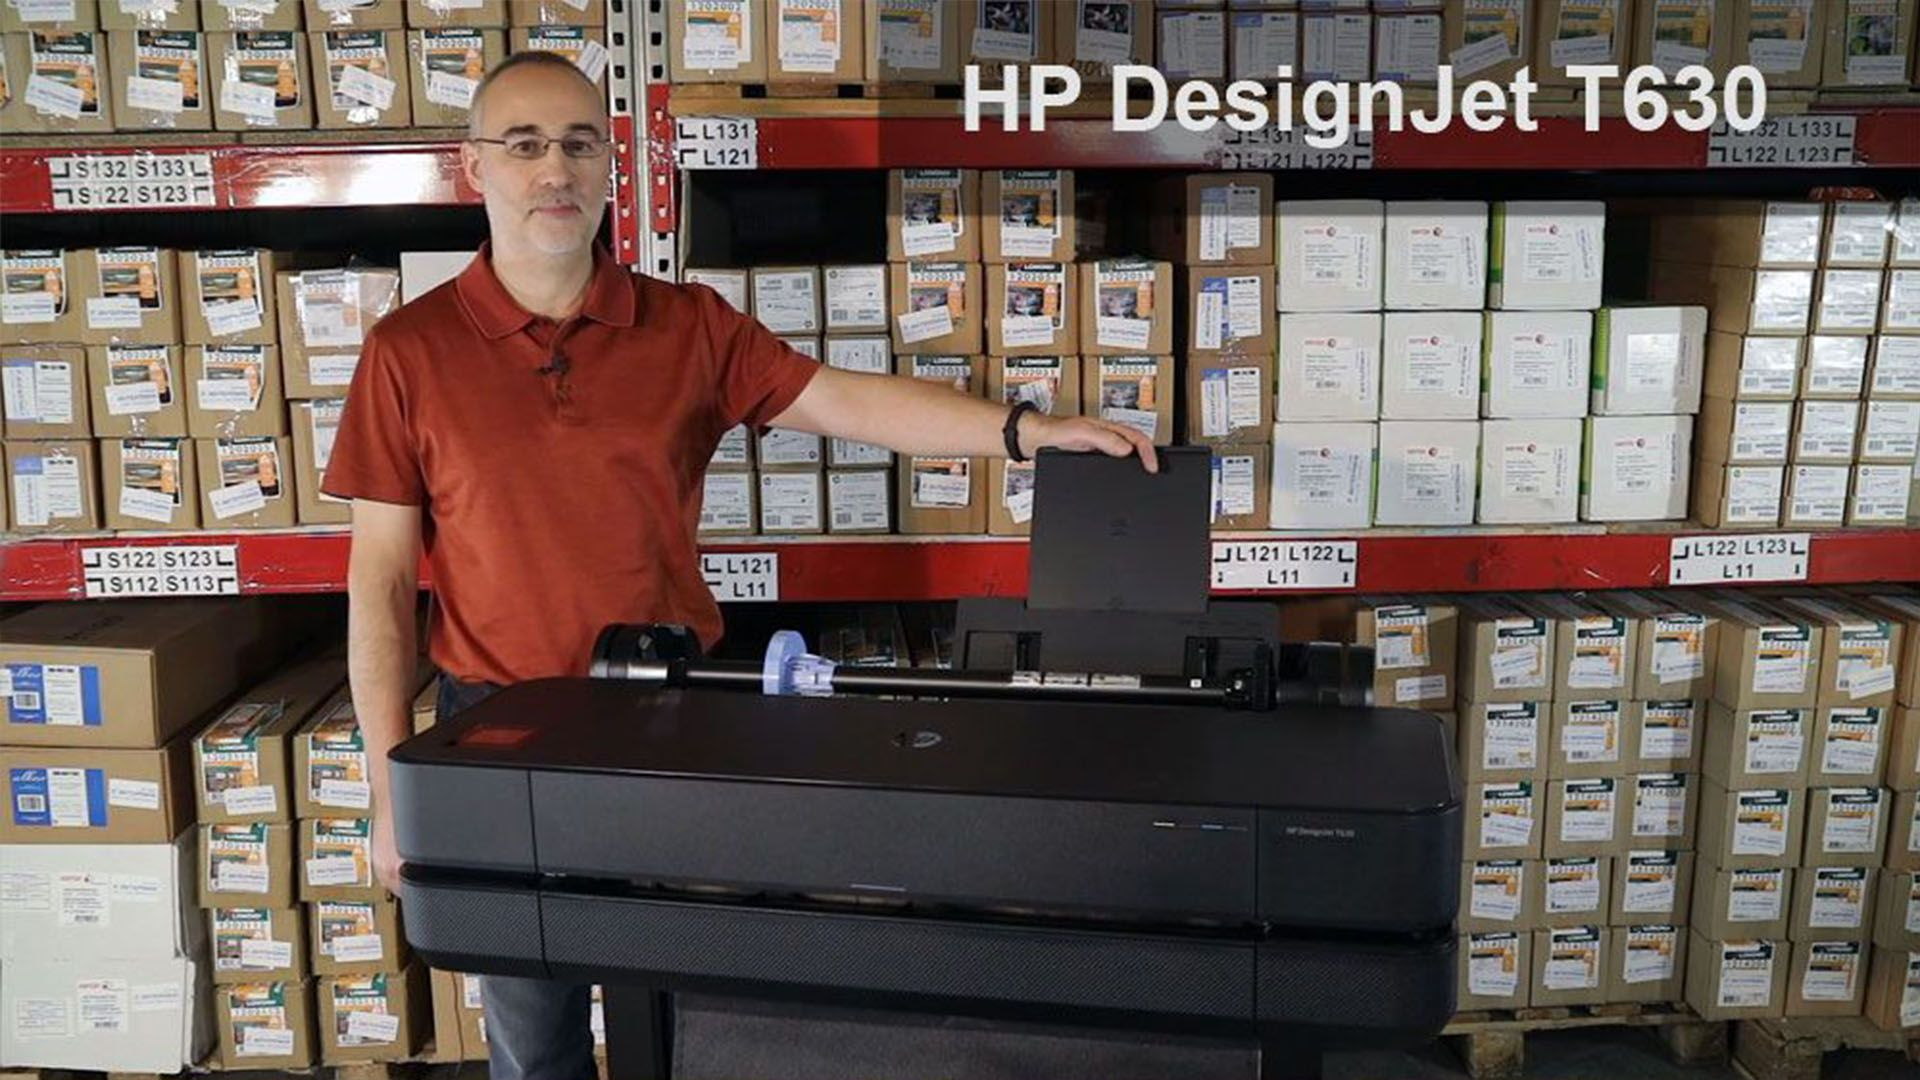 Видео HP DesignJet T630